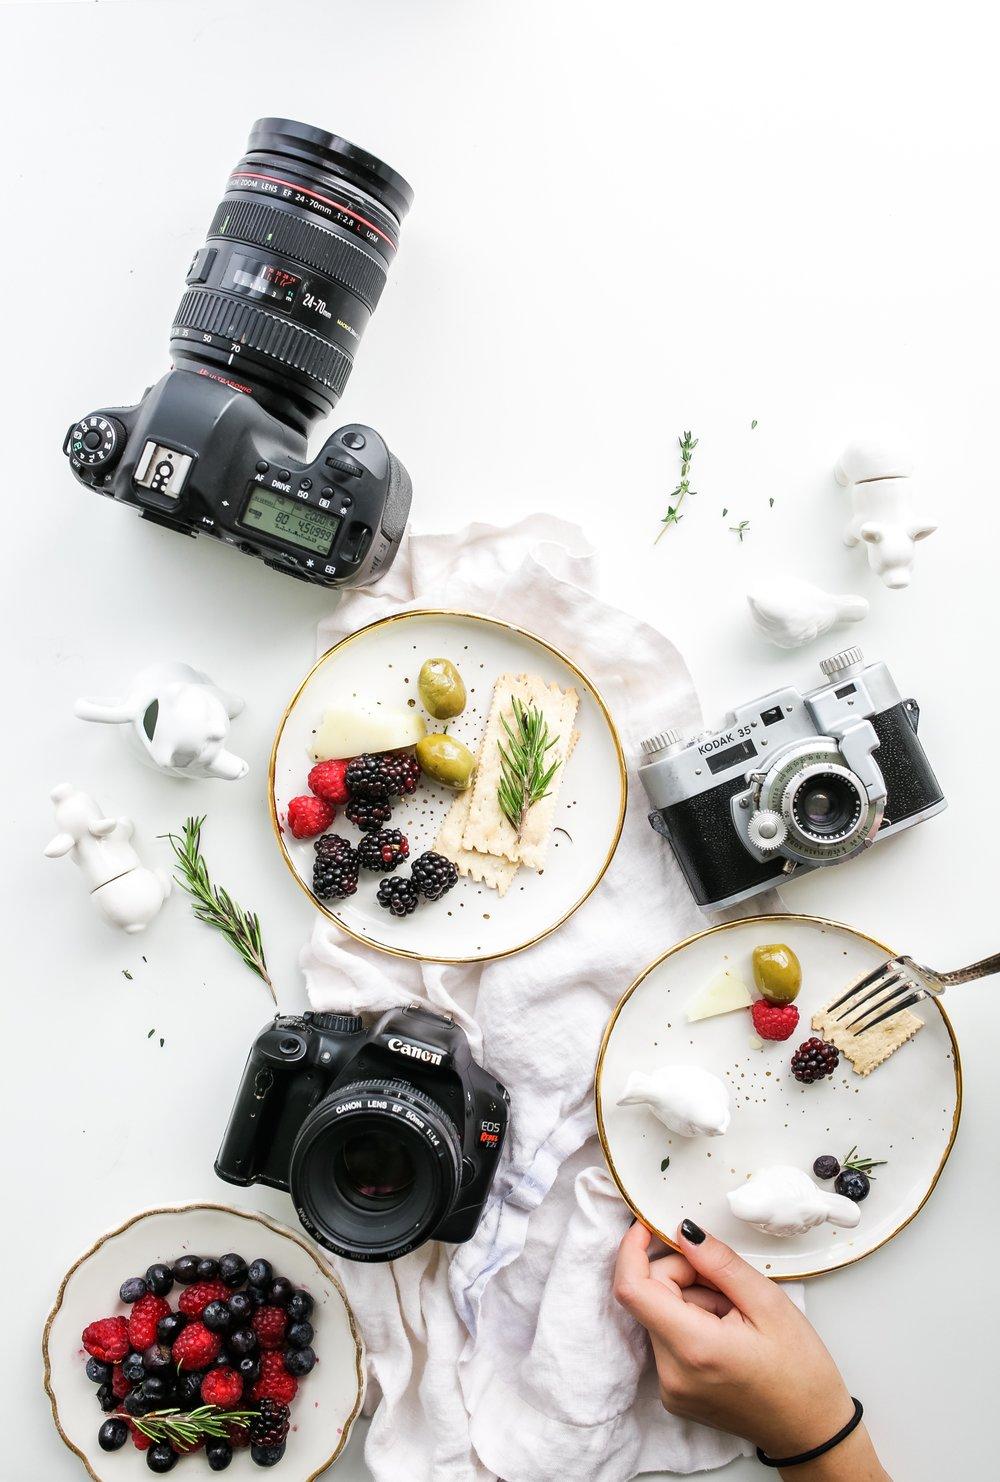 PHOTOGRAPHY CREDIT: BROOKE LARK